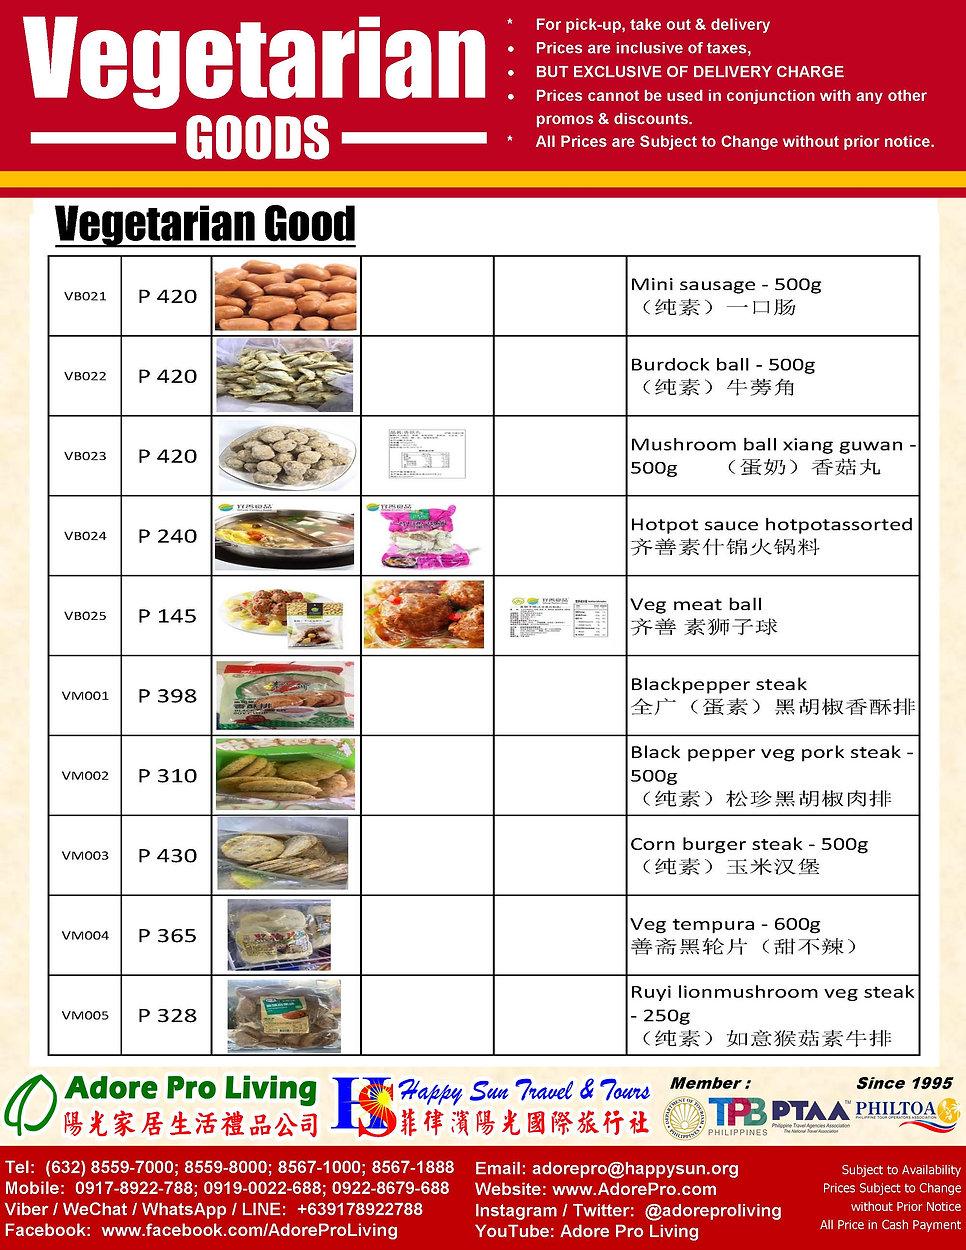 P6_Vegetarian Goods_20200929.jpg